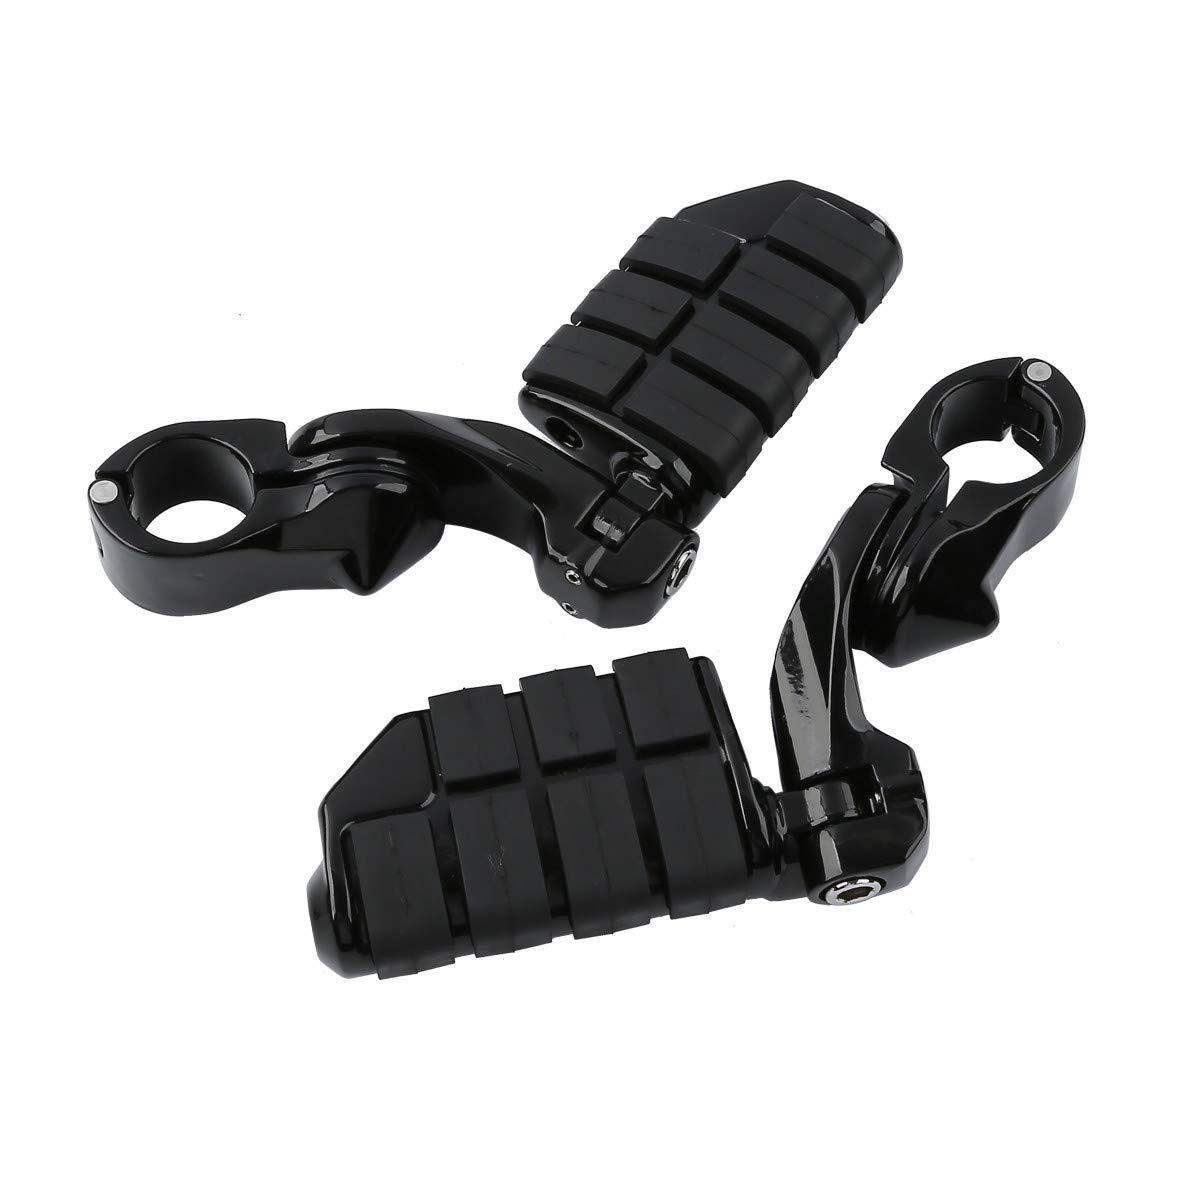 Motorcycle Footboards Universal 32mm Adjustable Highway Foot Pegs Footpeg Footrest Bracket Set For Honda┃ Kawasaki┃ Suzuki┃ Yamaha ┃Harley Black